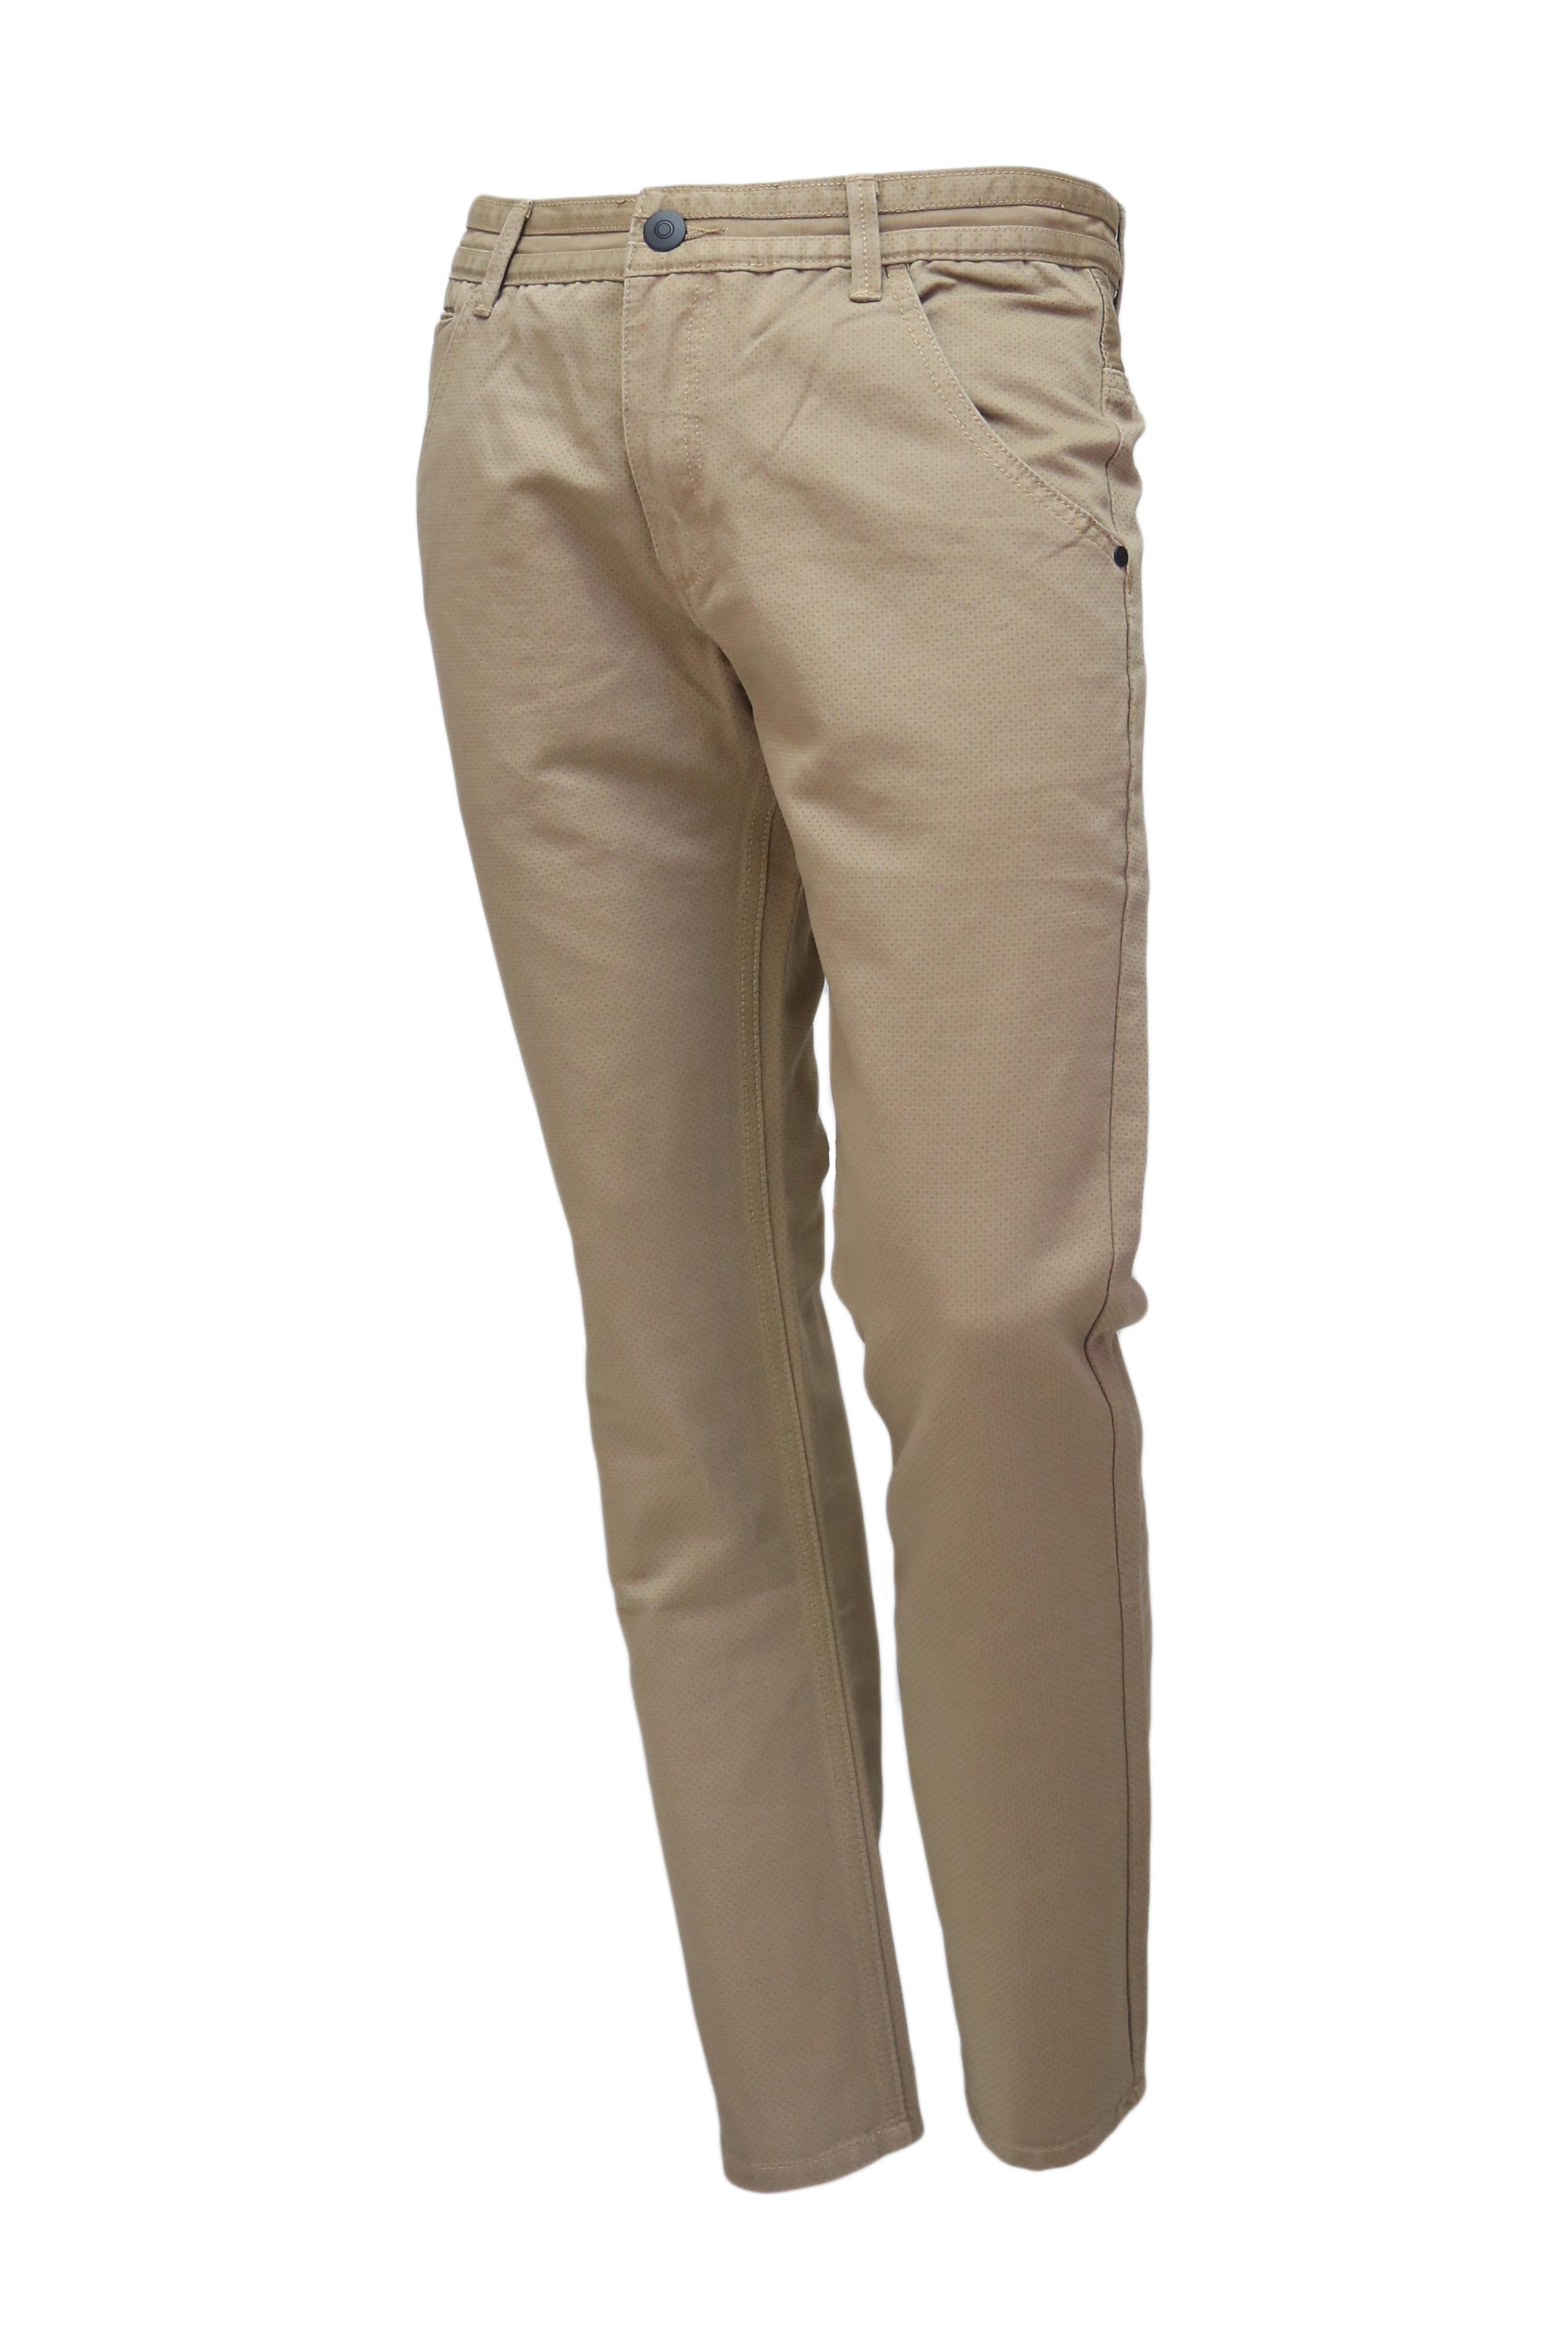 7 Pants.png